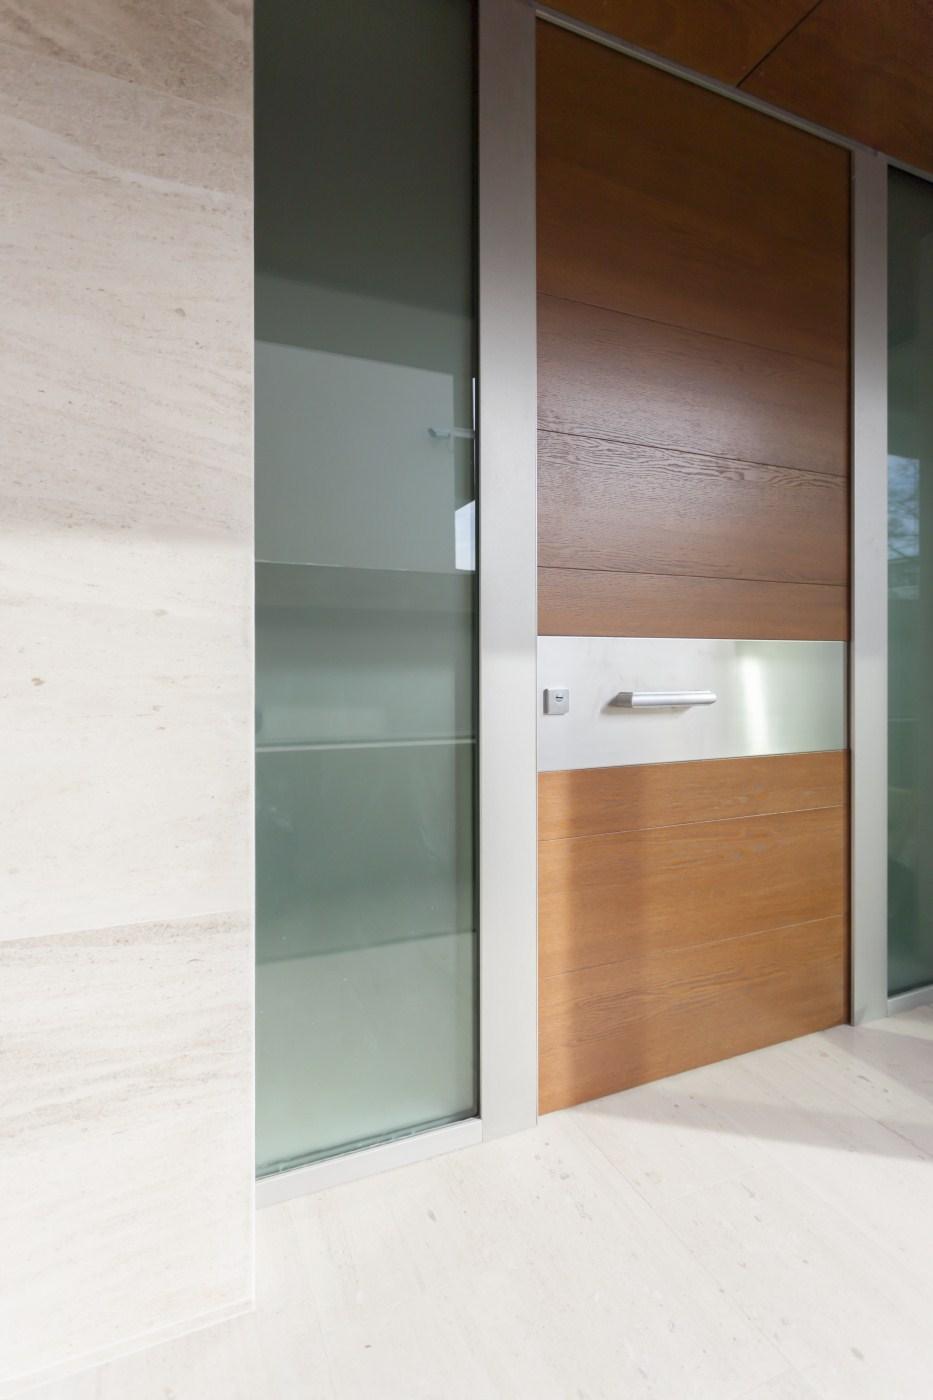 https://nbc-arhitect.ro/wp-content/uploads/2020/10/NBC-ARHITECT-_-housing-_-Sandu-Aldea-House-Villa-_-exterior-view-_-entrance_5.jpg